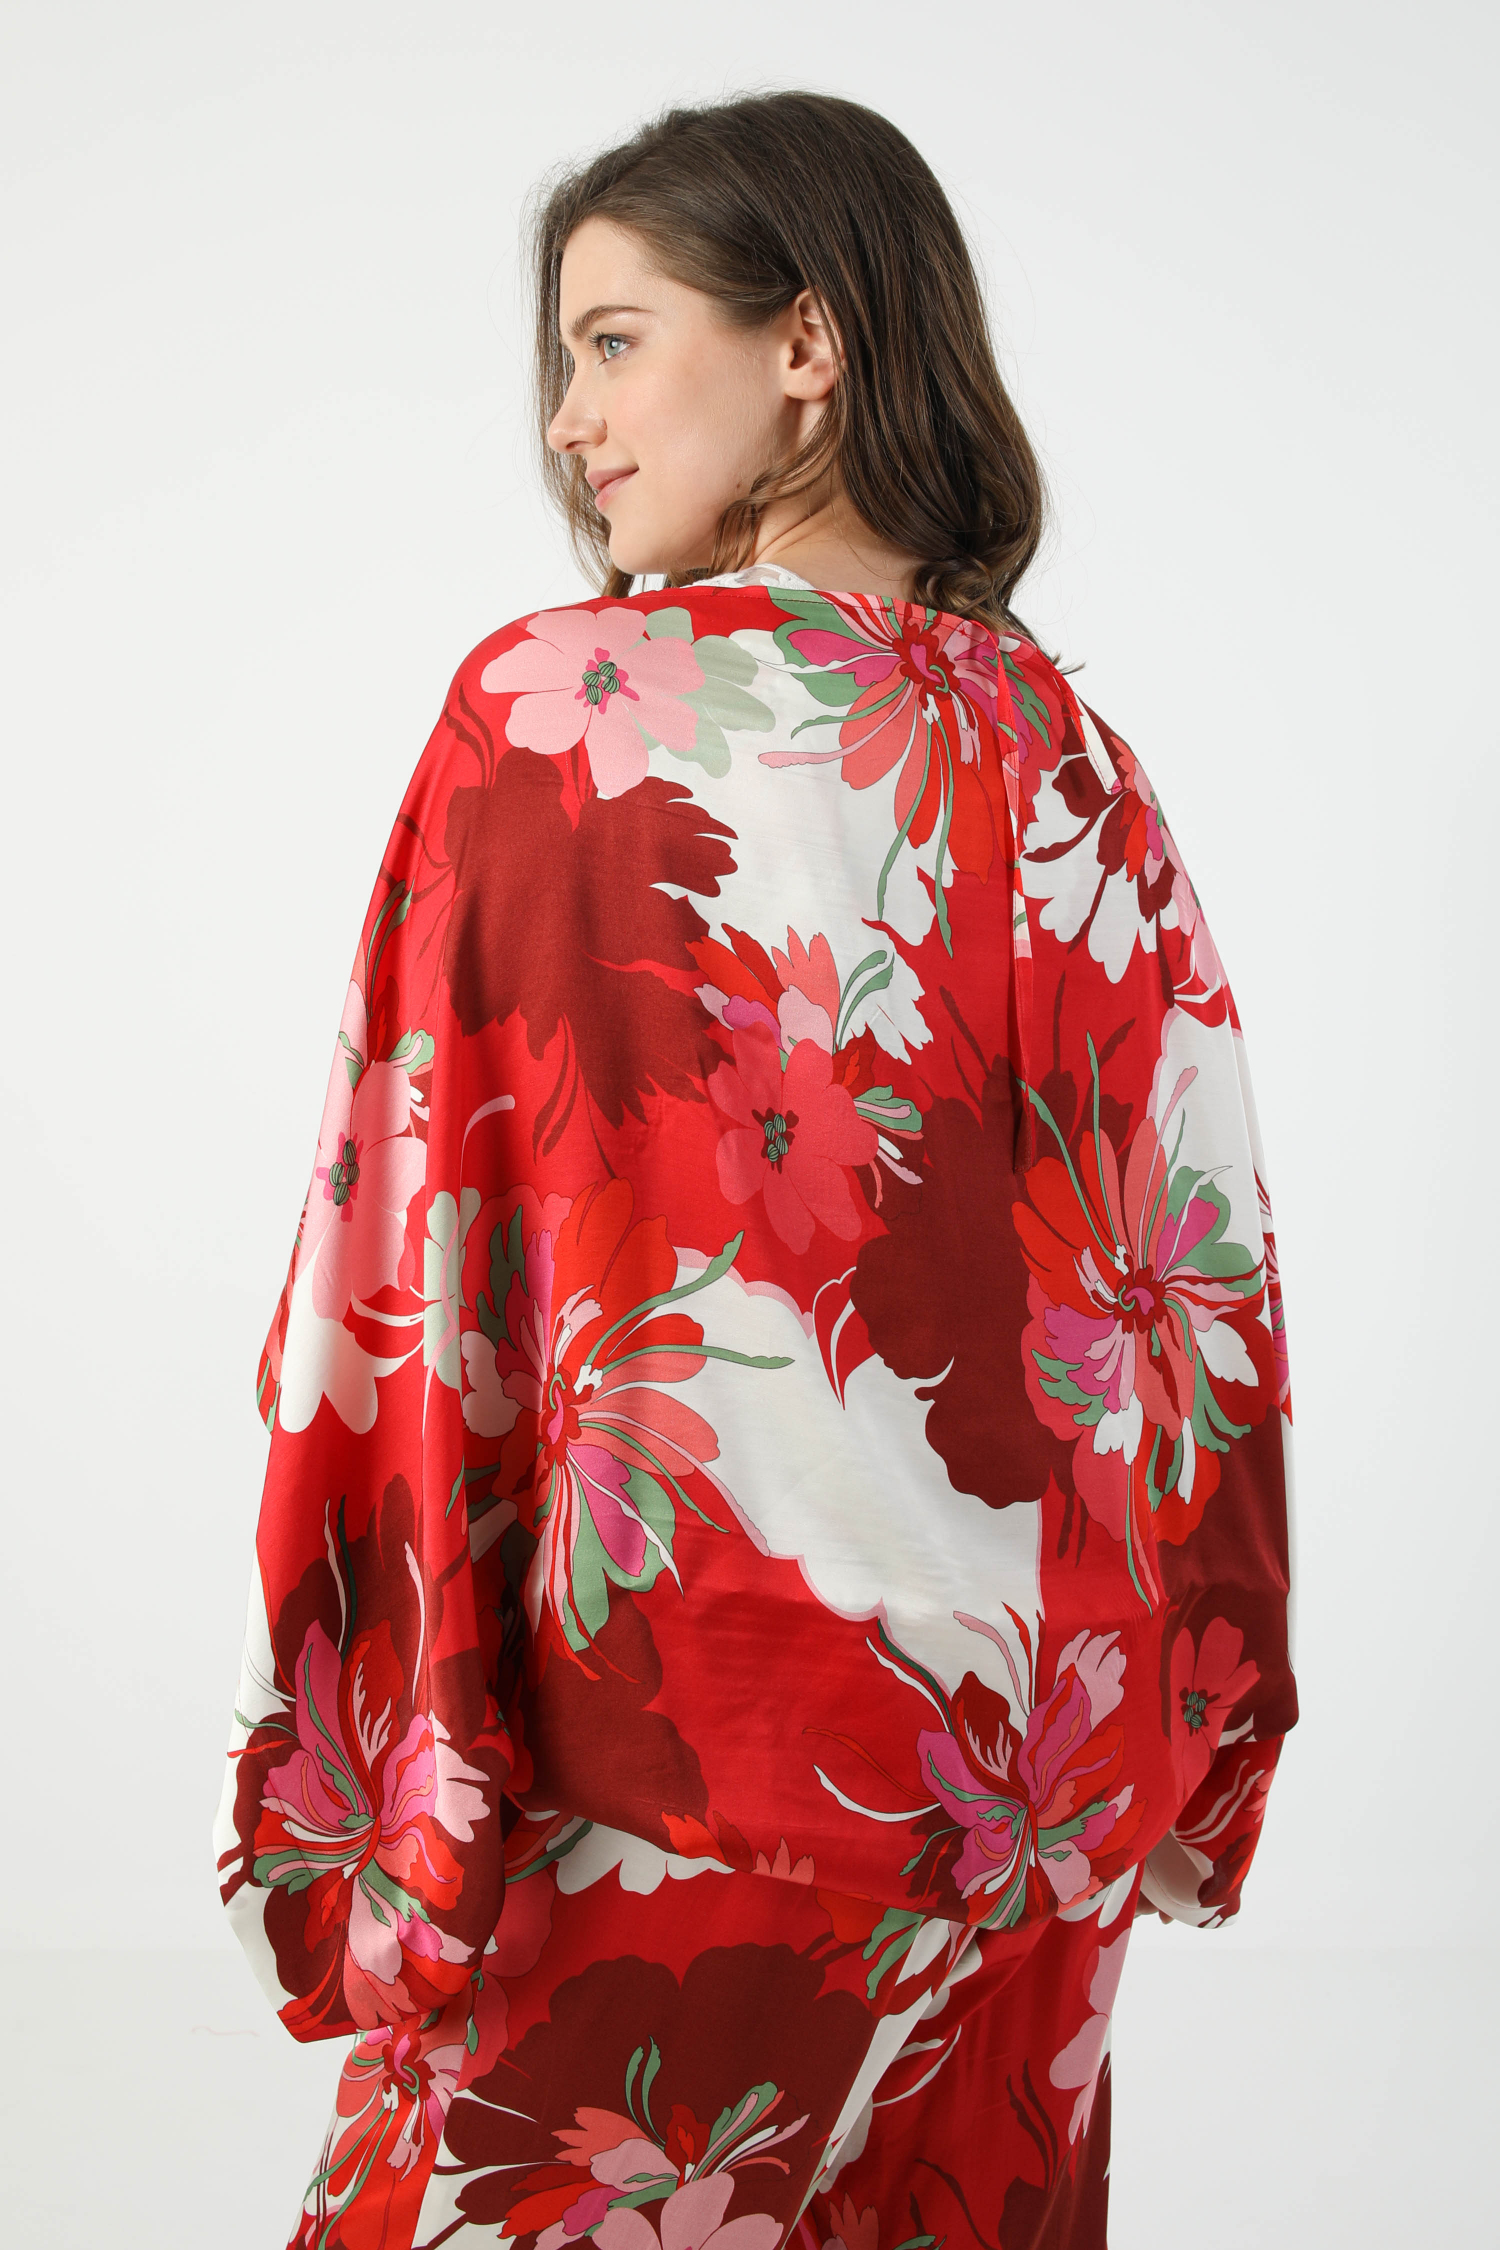 Printed stole bolero in satin floral oeko-tex fabric